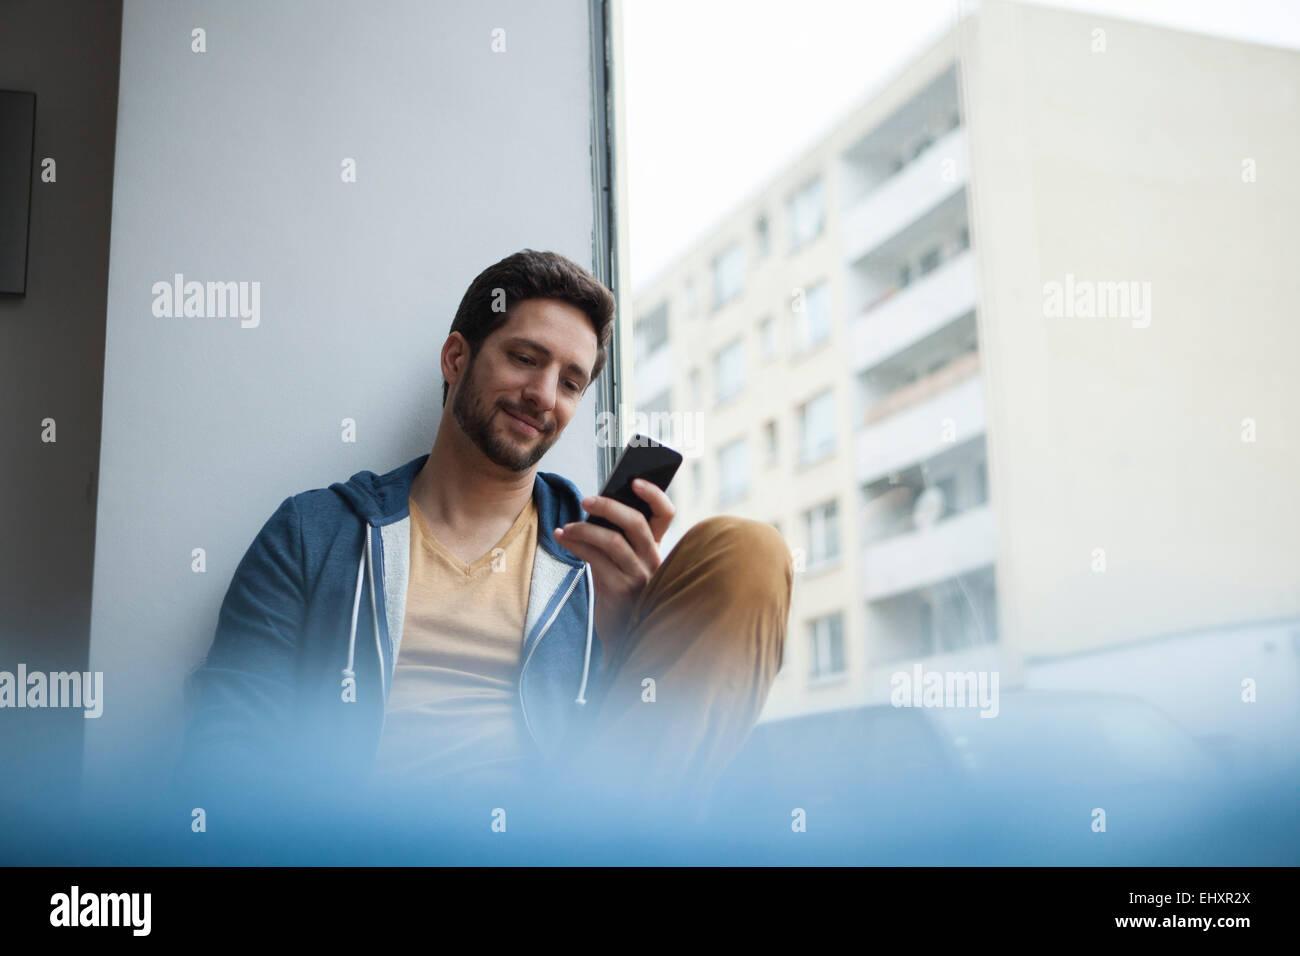 Smiling man reading SMS - Stock Image